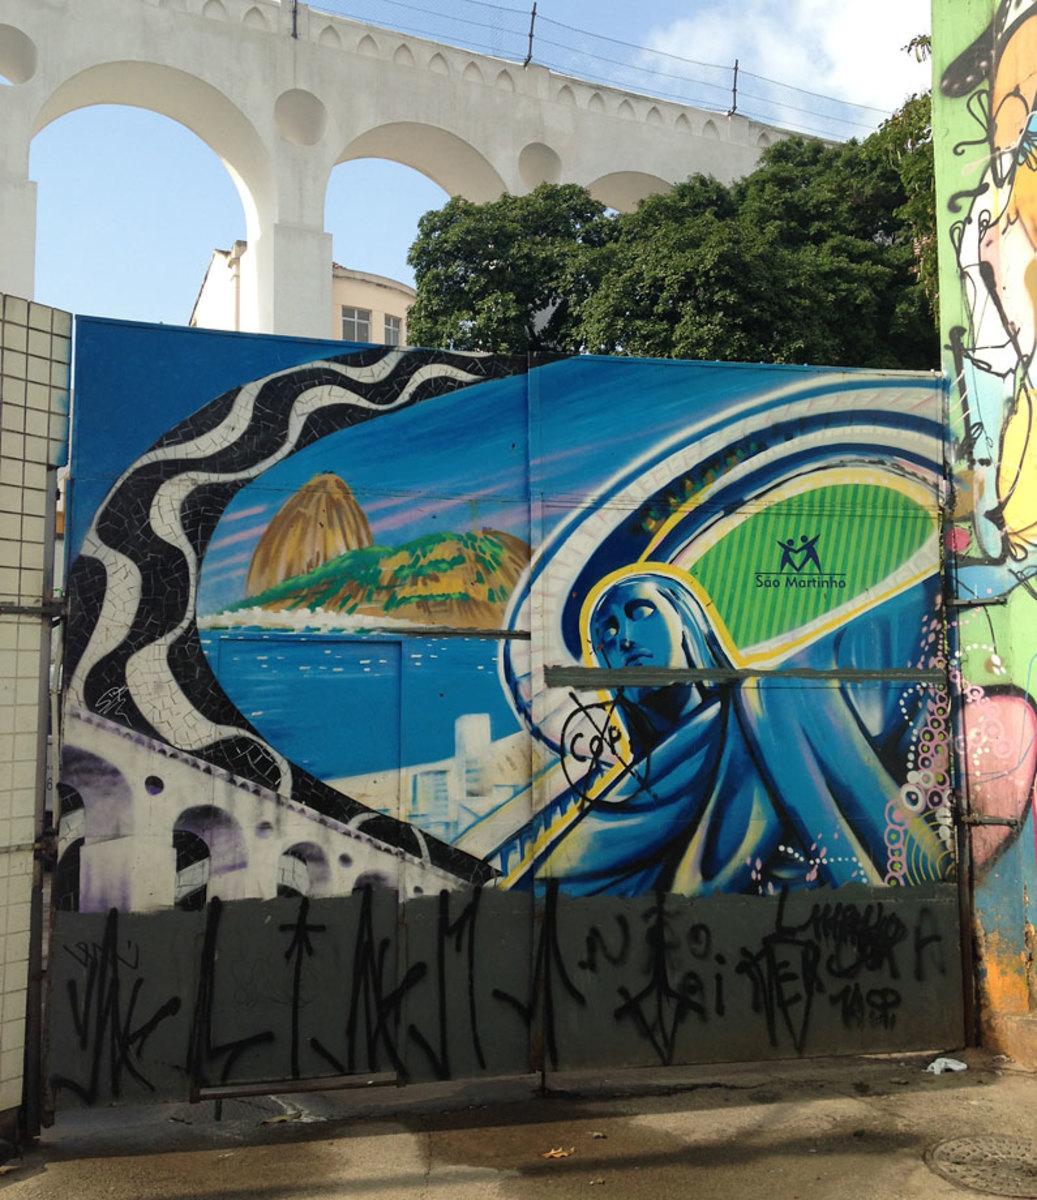 soccer-graffiti-mural-rio-IMG_8501.jpg